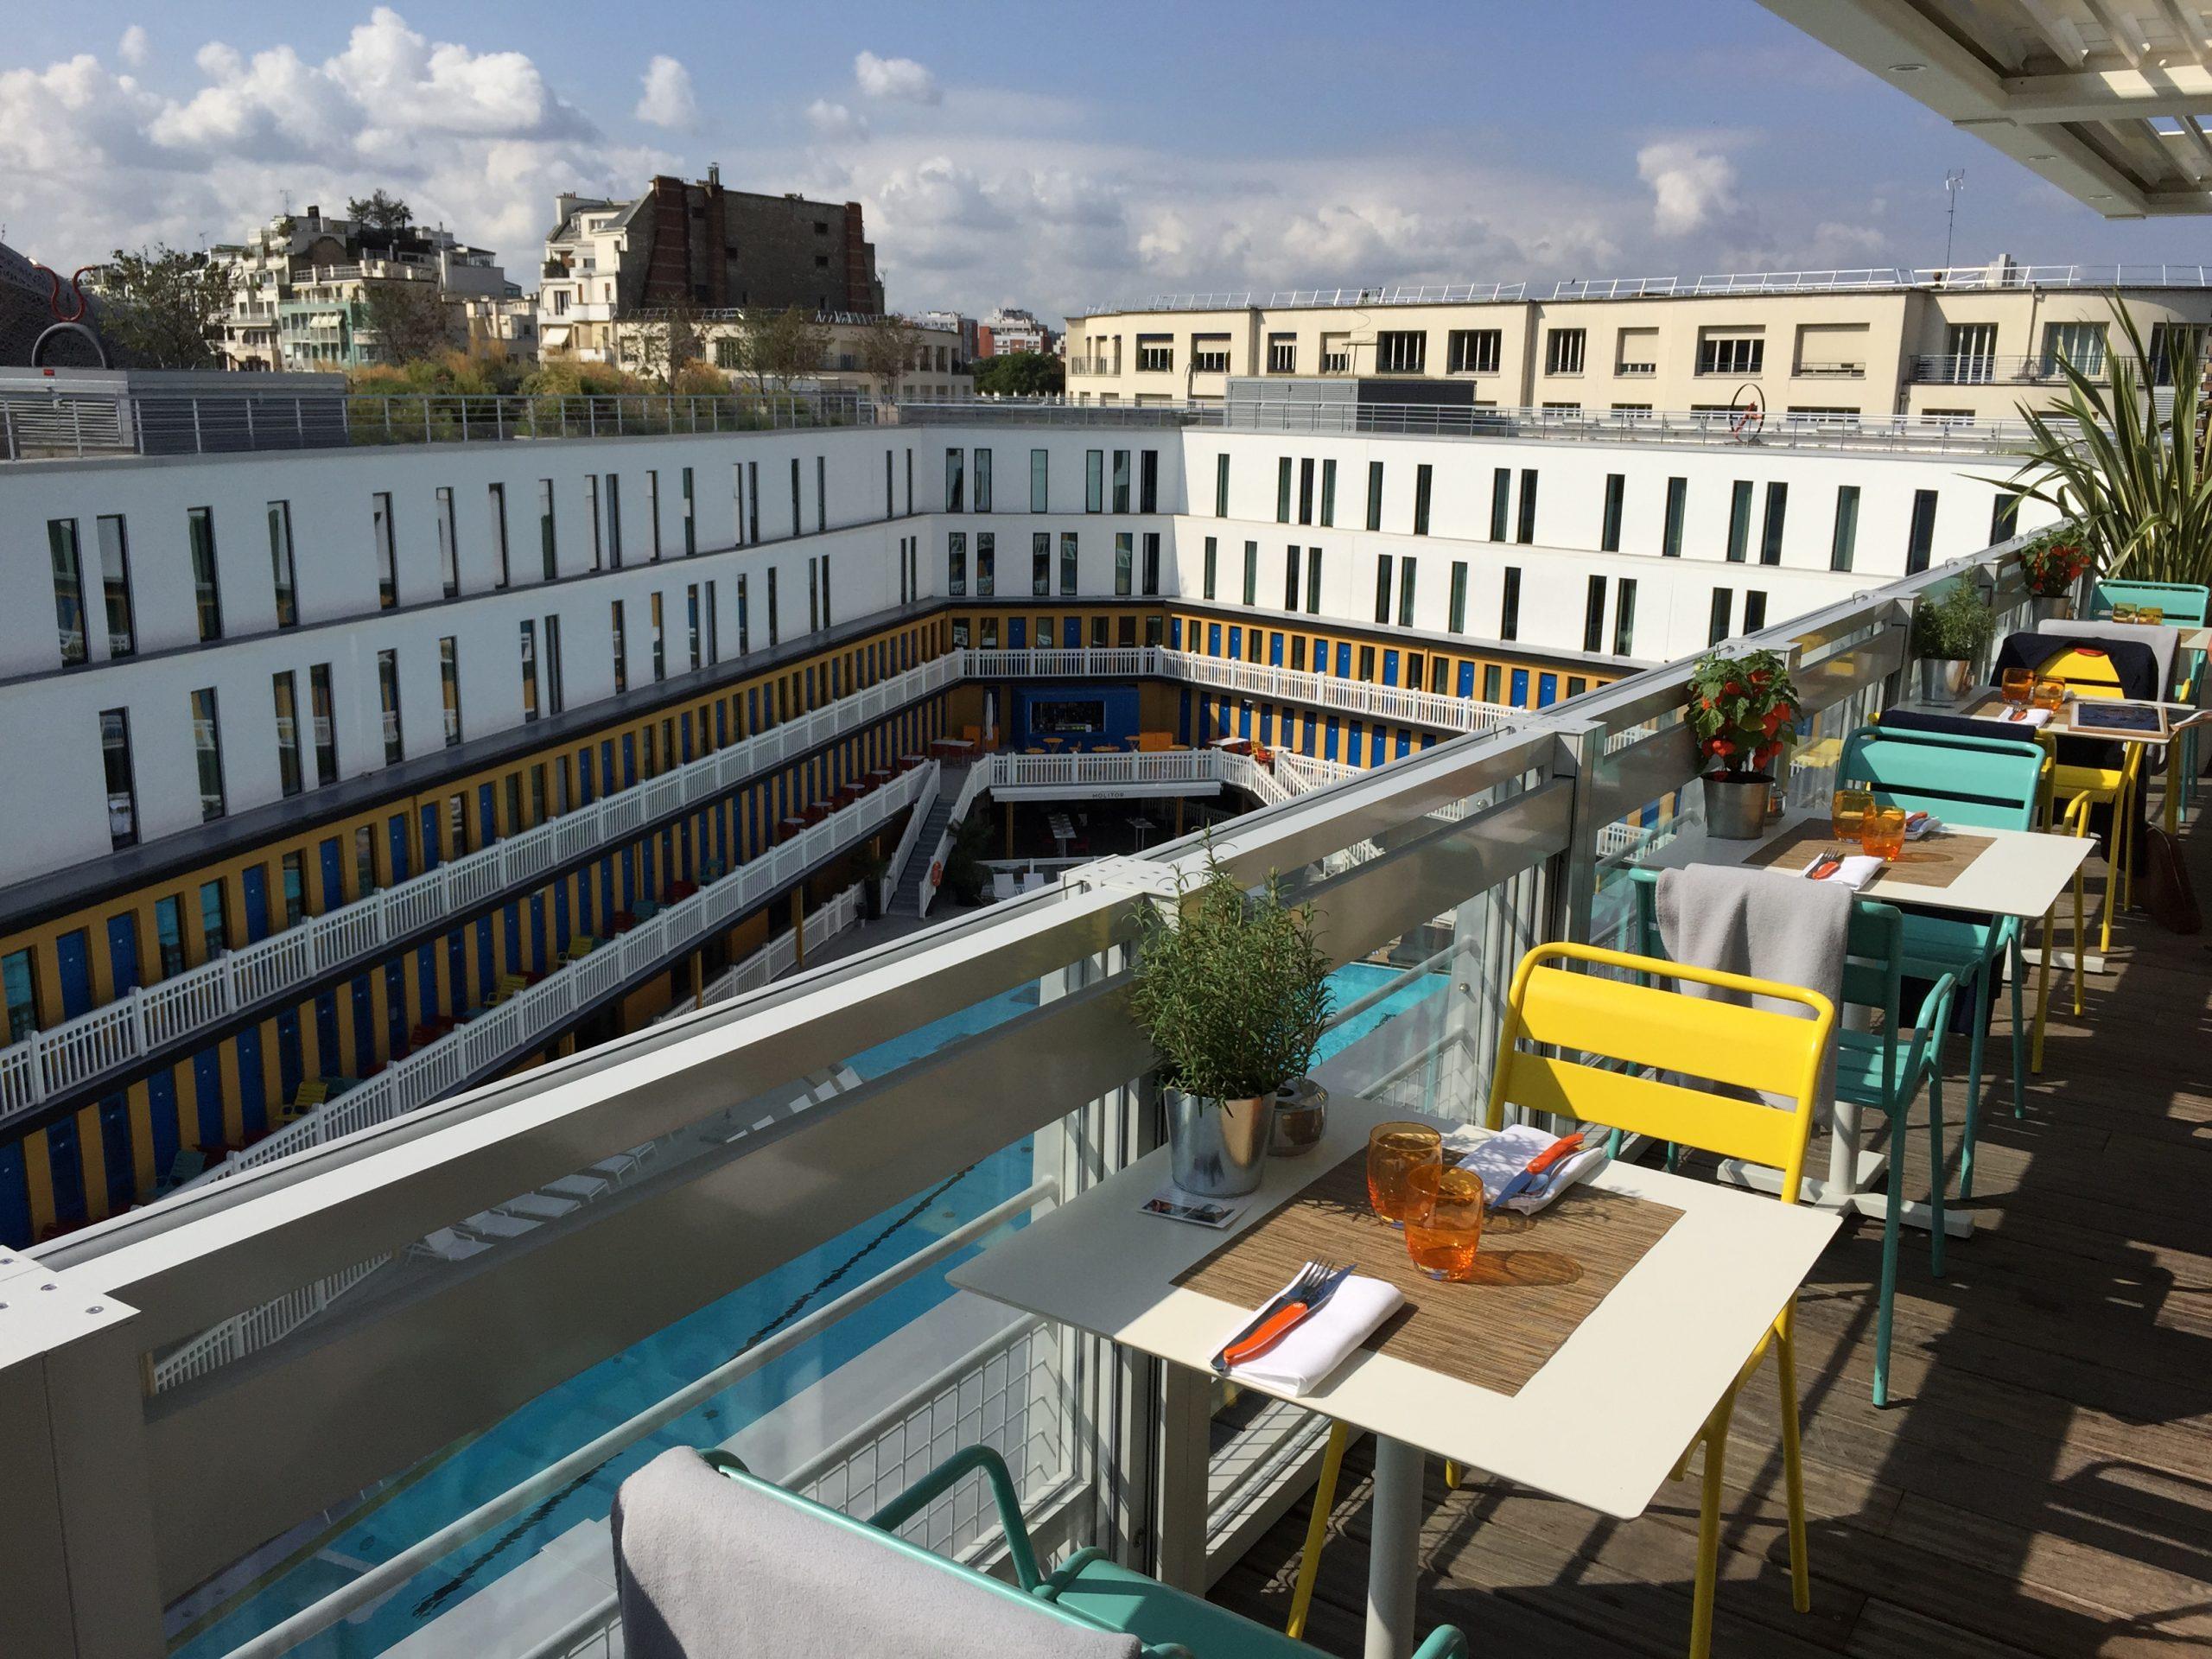 Hotel Molitor Mgallery Restaurant – Fancy Oli tout Restaurant Piscine Molitor